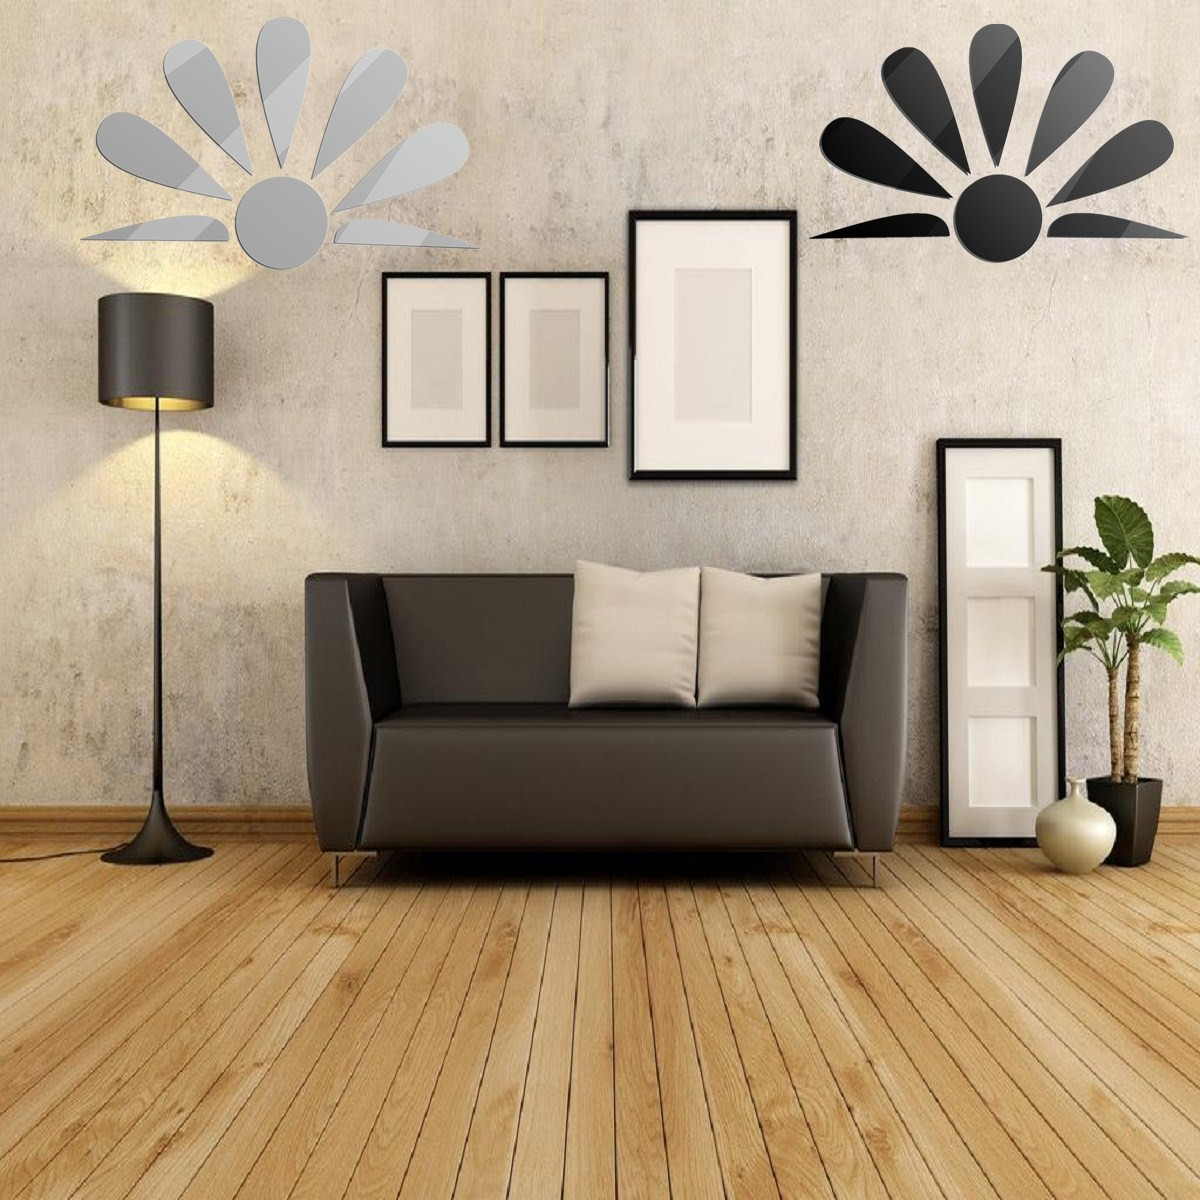 8 pcs epanouissement diy autocollant mural miroir adh sif art d cor mur chambre. Black Bedroom Furniture Sets. Home Design Ideas